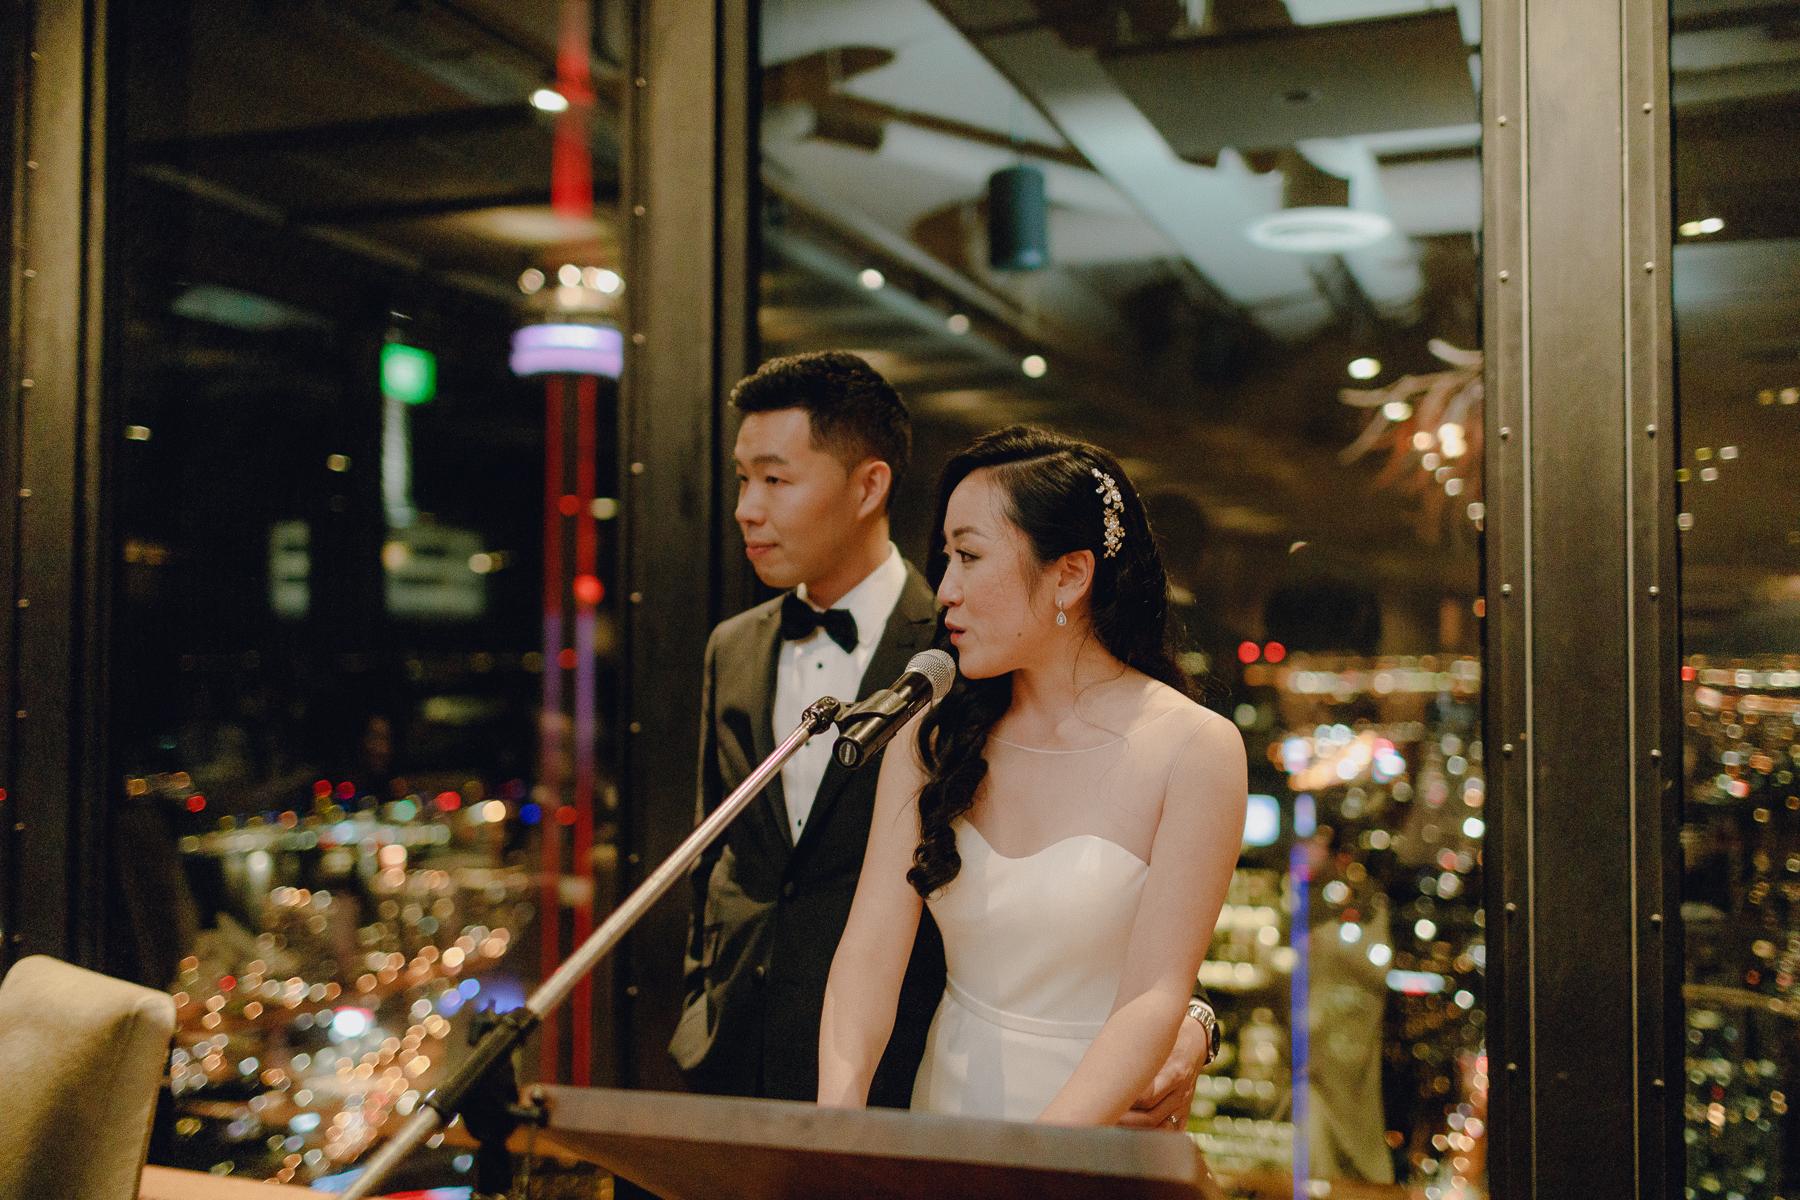 cannoe-restaurannt-wedding 0102.jpg